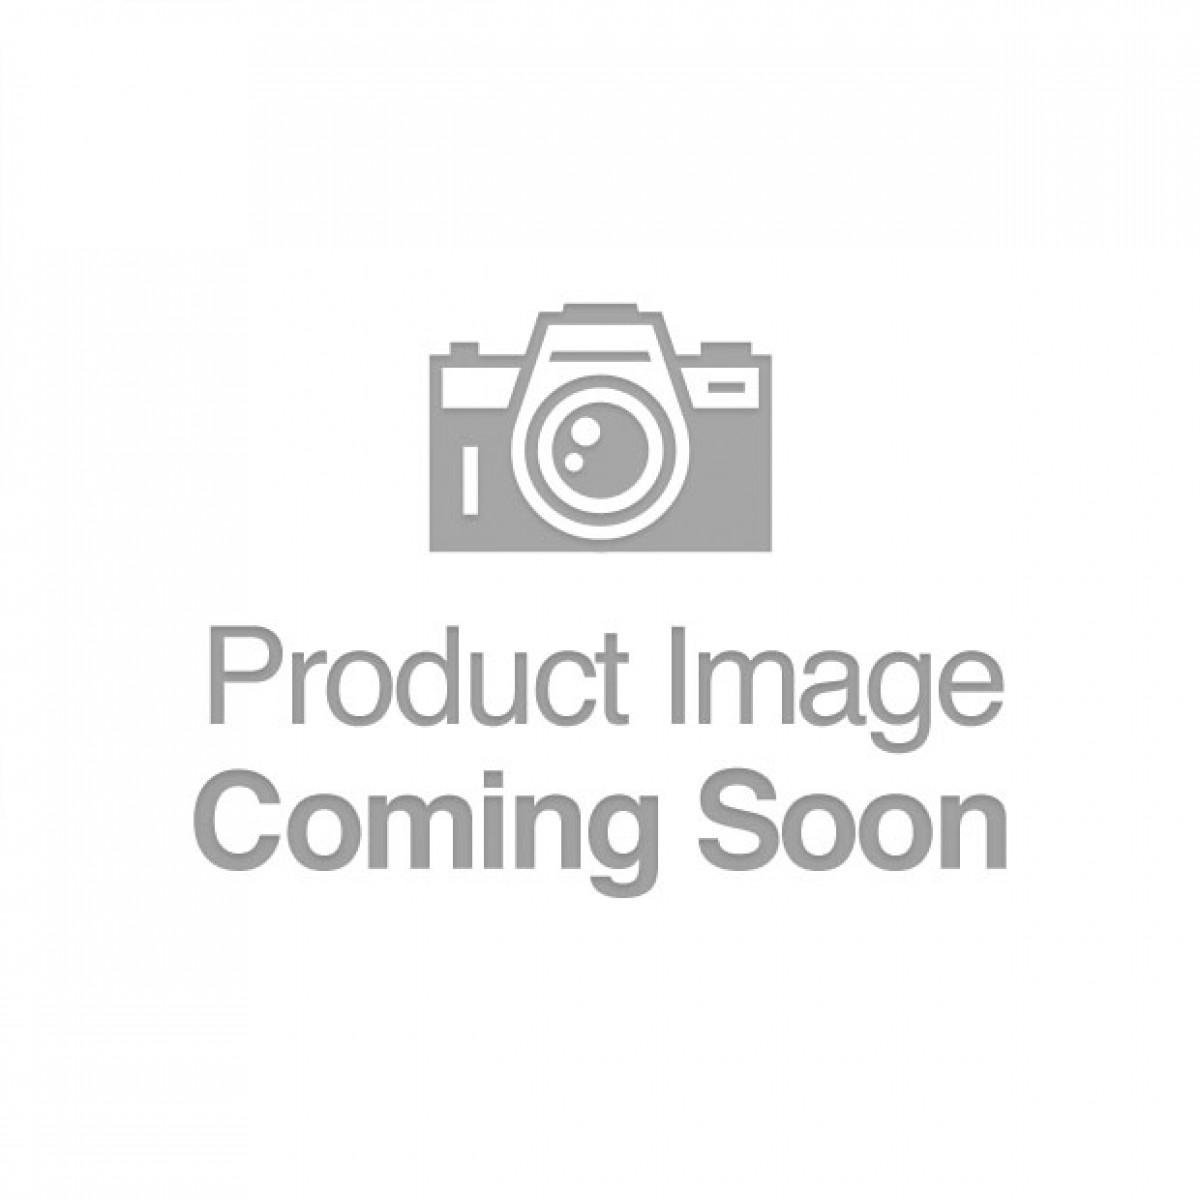 Adam & Eve Three Hearts Gem Anal Plug Set - Silver/Red